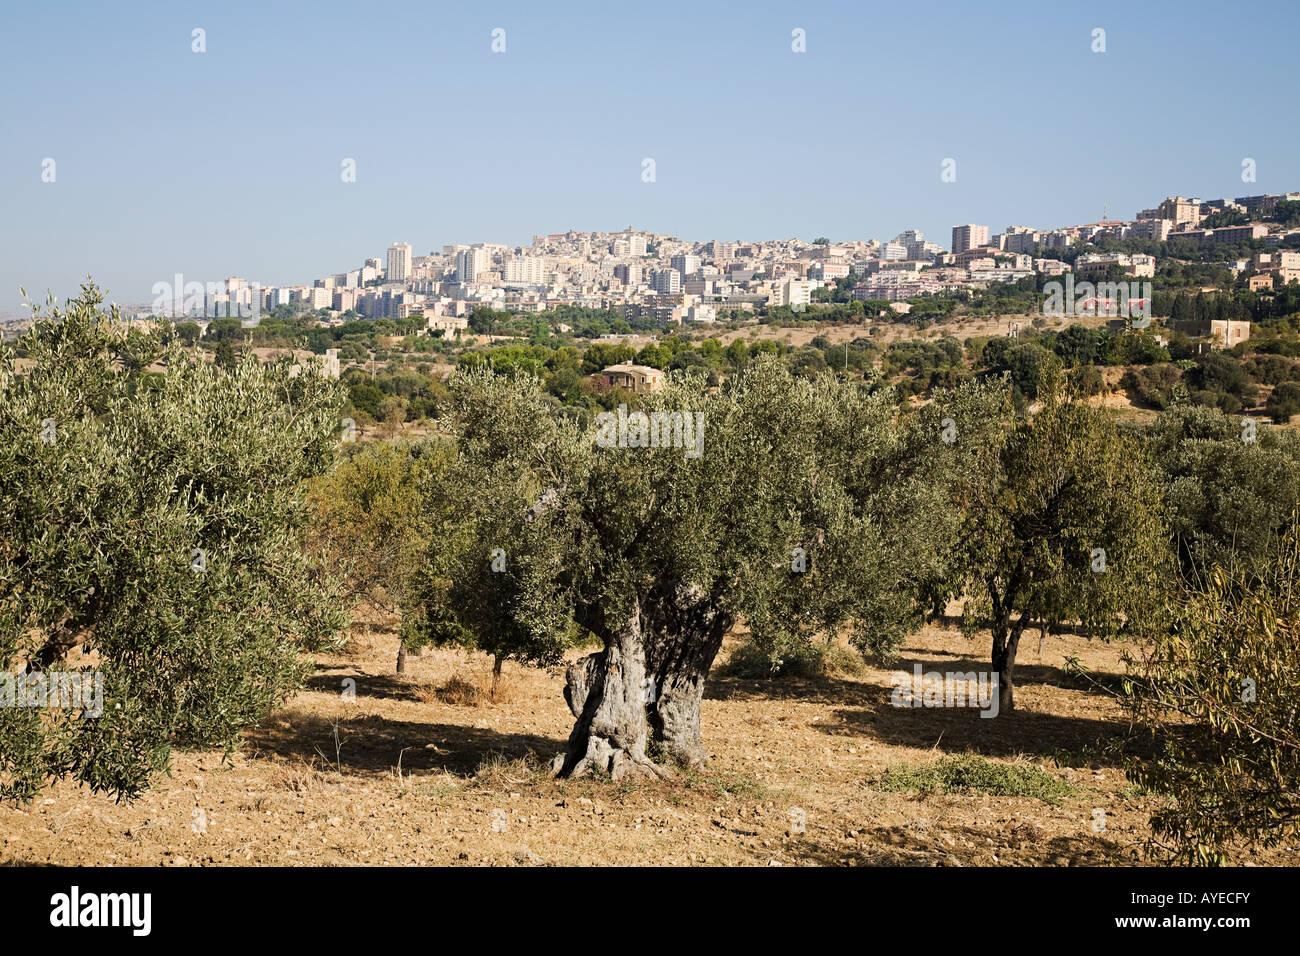 Sicily Olive Tree Stock Photos & Sicily Olive Tree Stock Images - Alamy